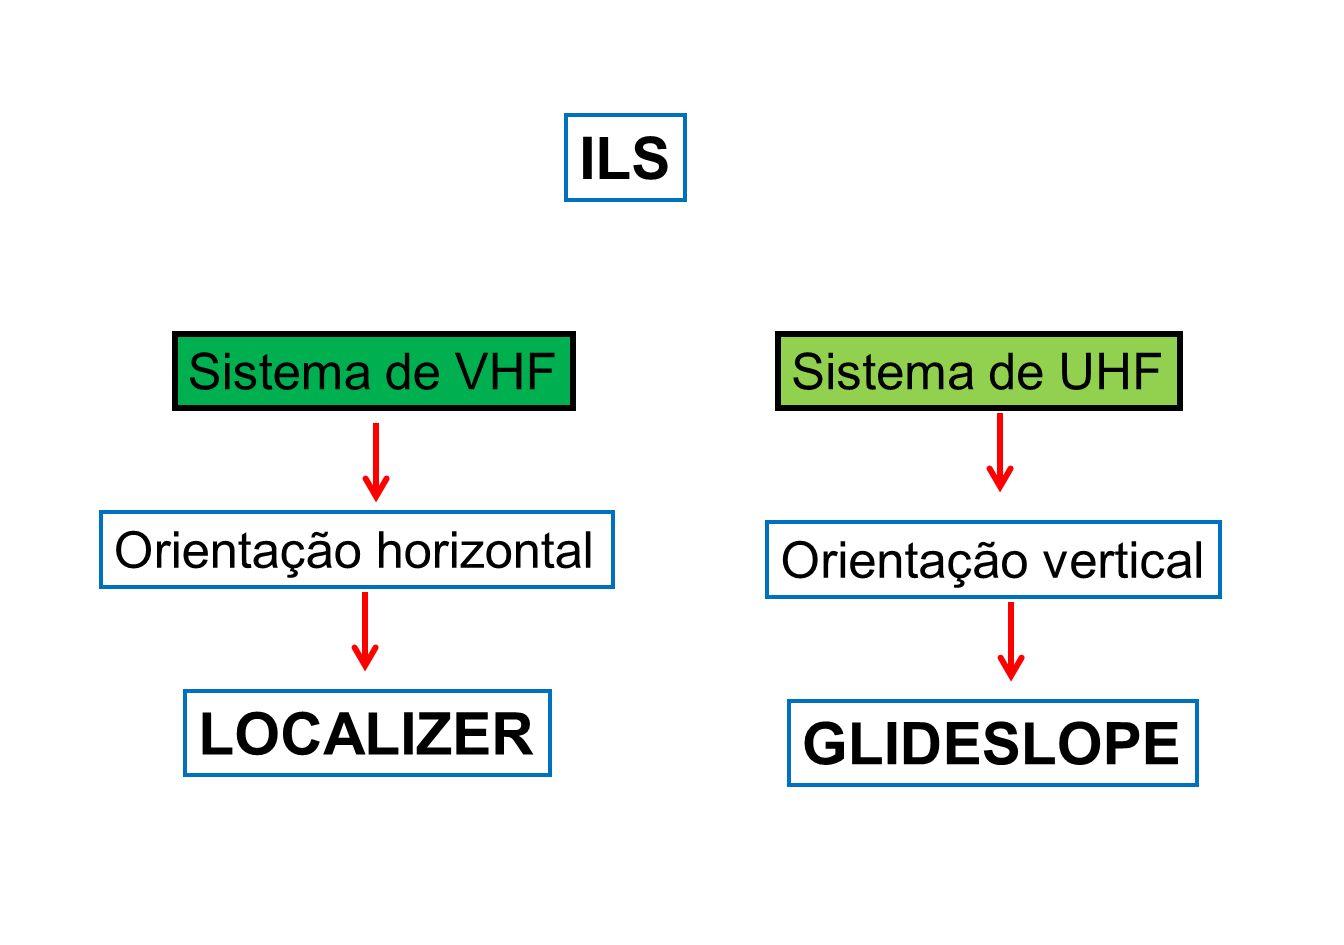 ILS LOCALIZER GLIDESLOPE Sistema de VHF Sistema de UHF